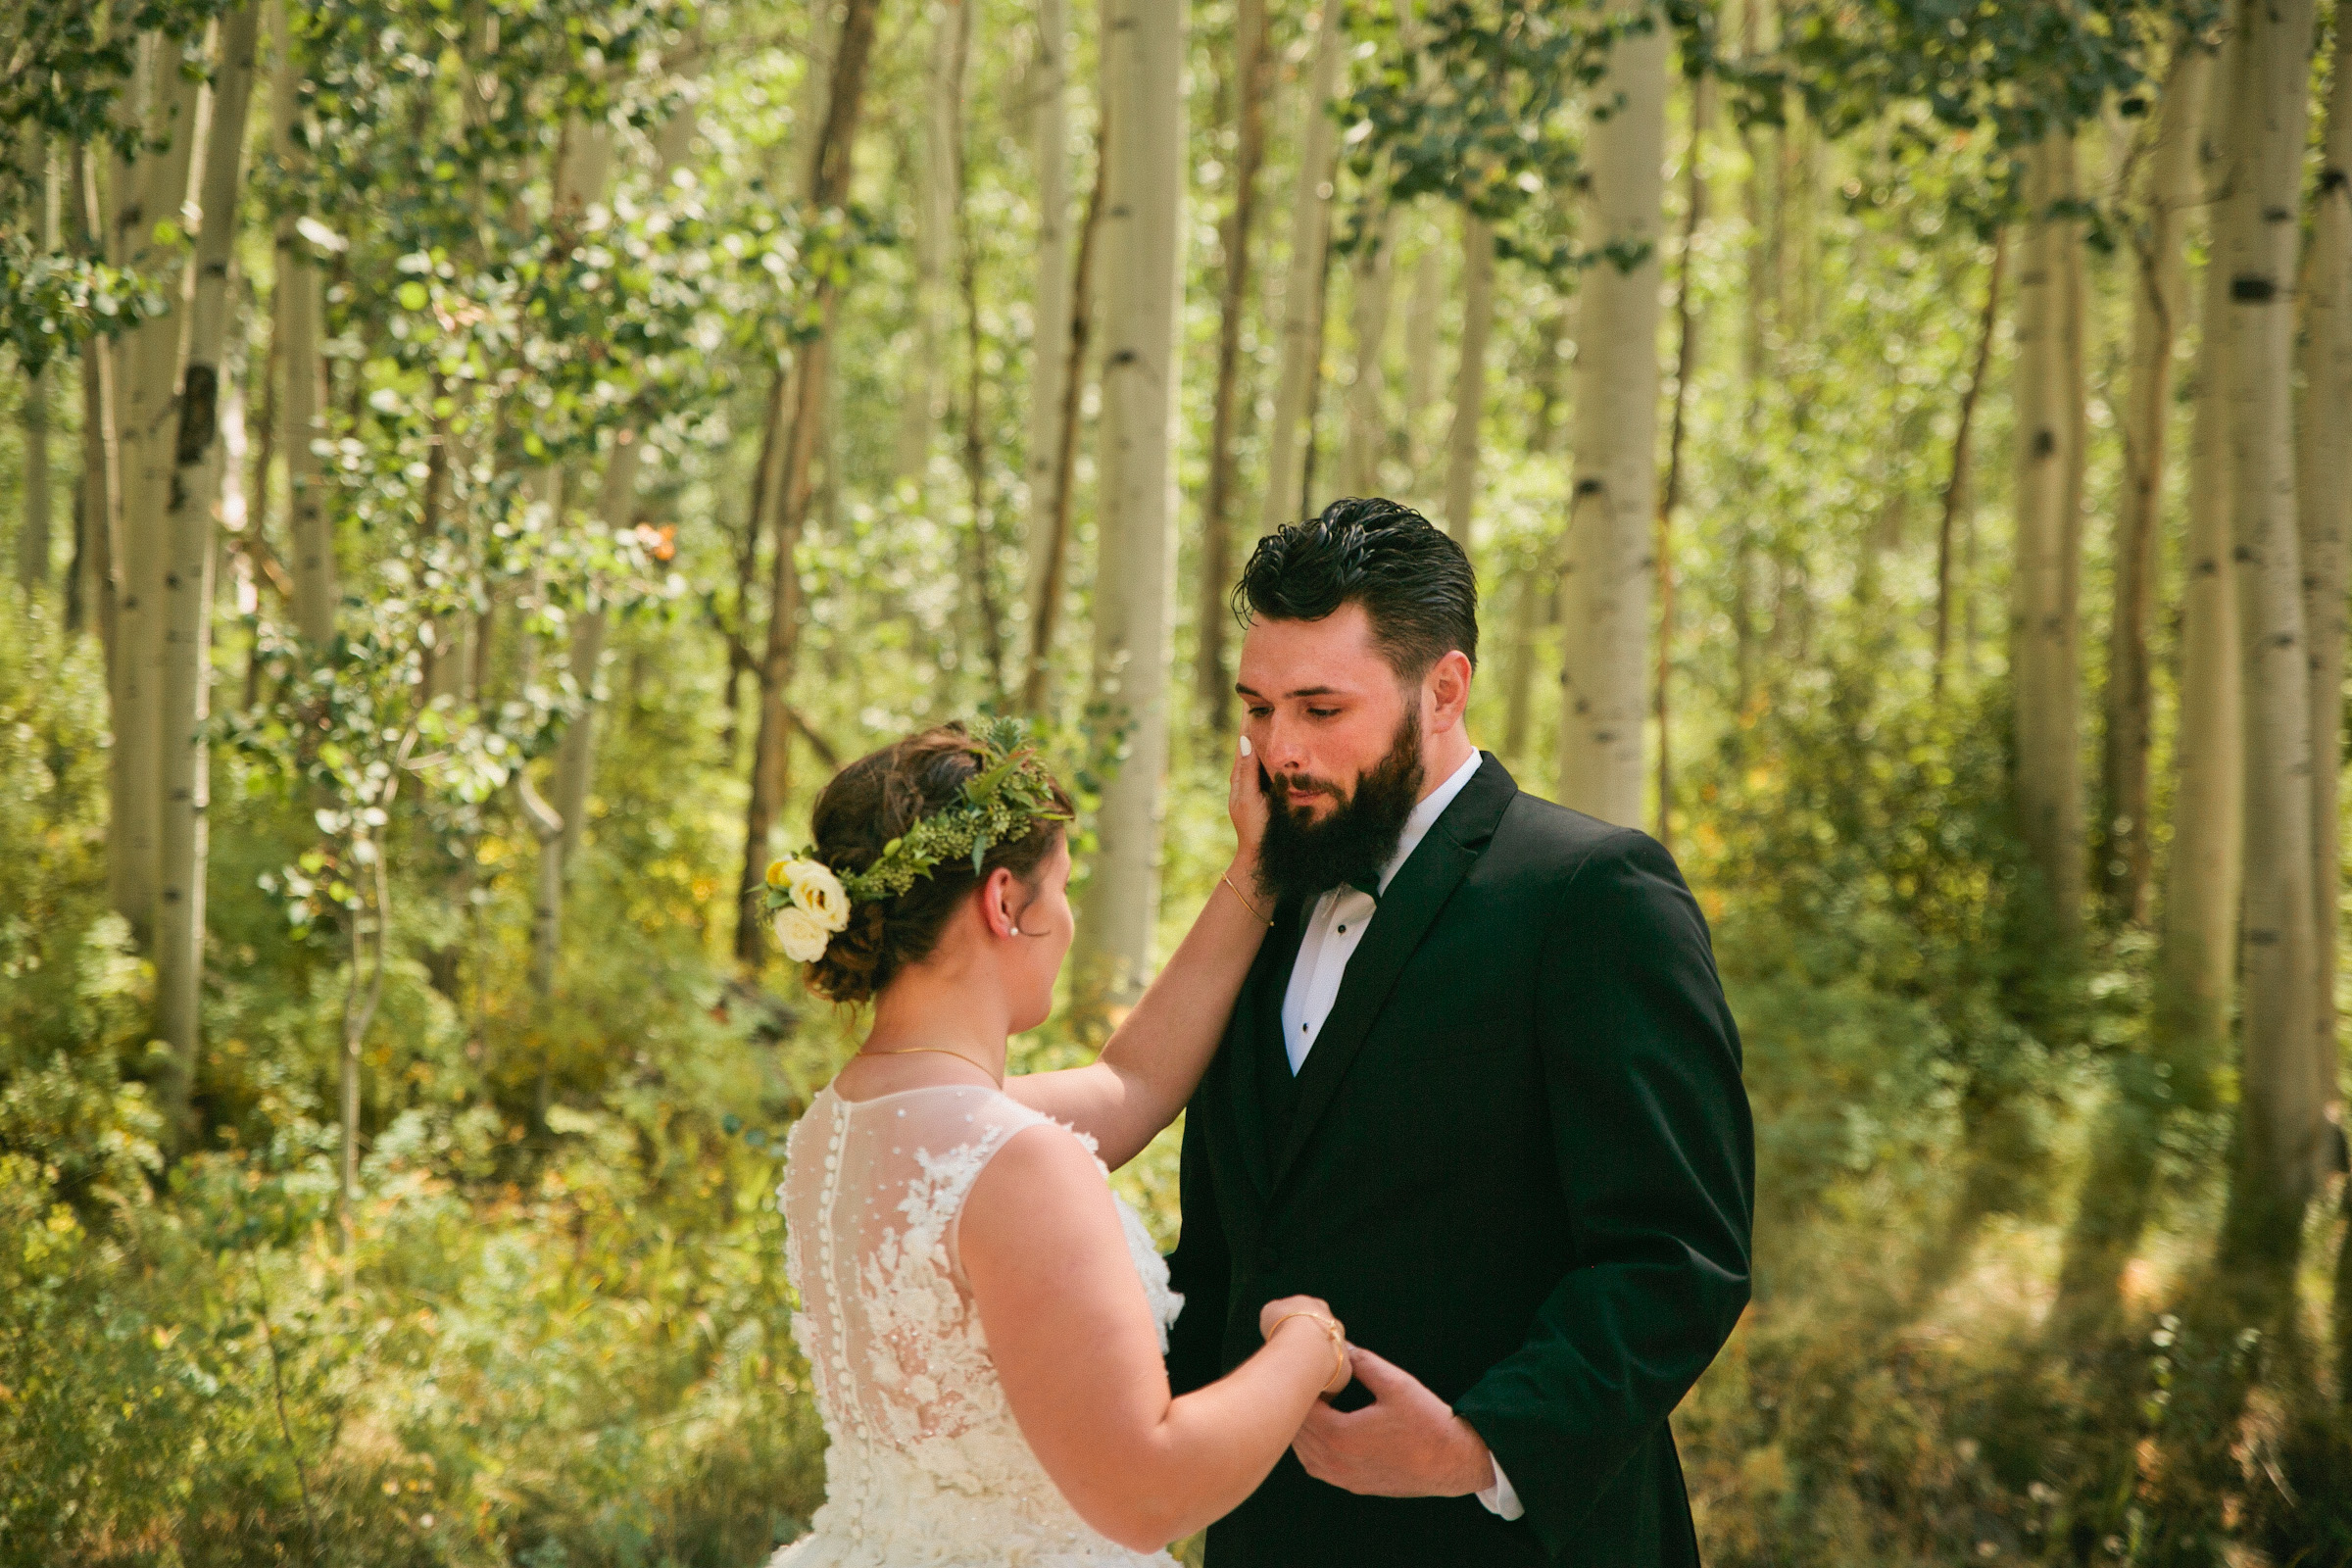 Cheap destination wedding photographers under $3000 // Colorado Elopement photography